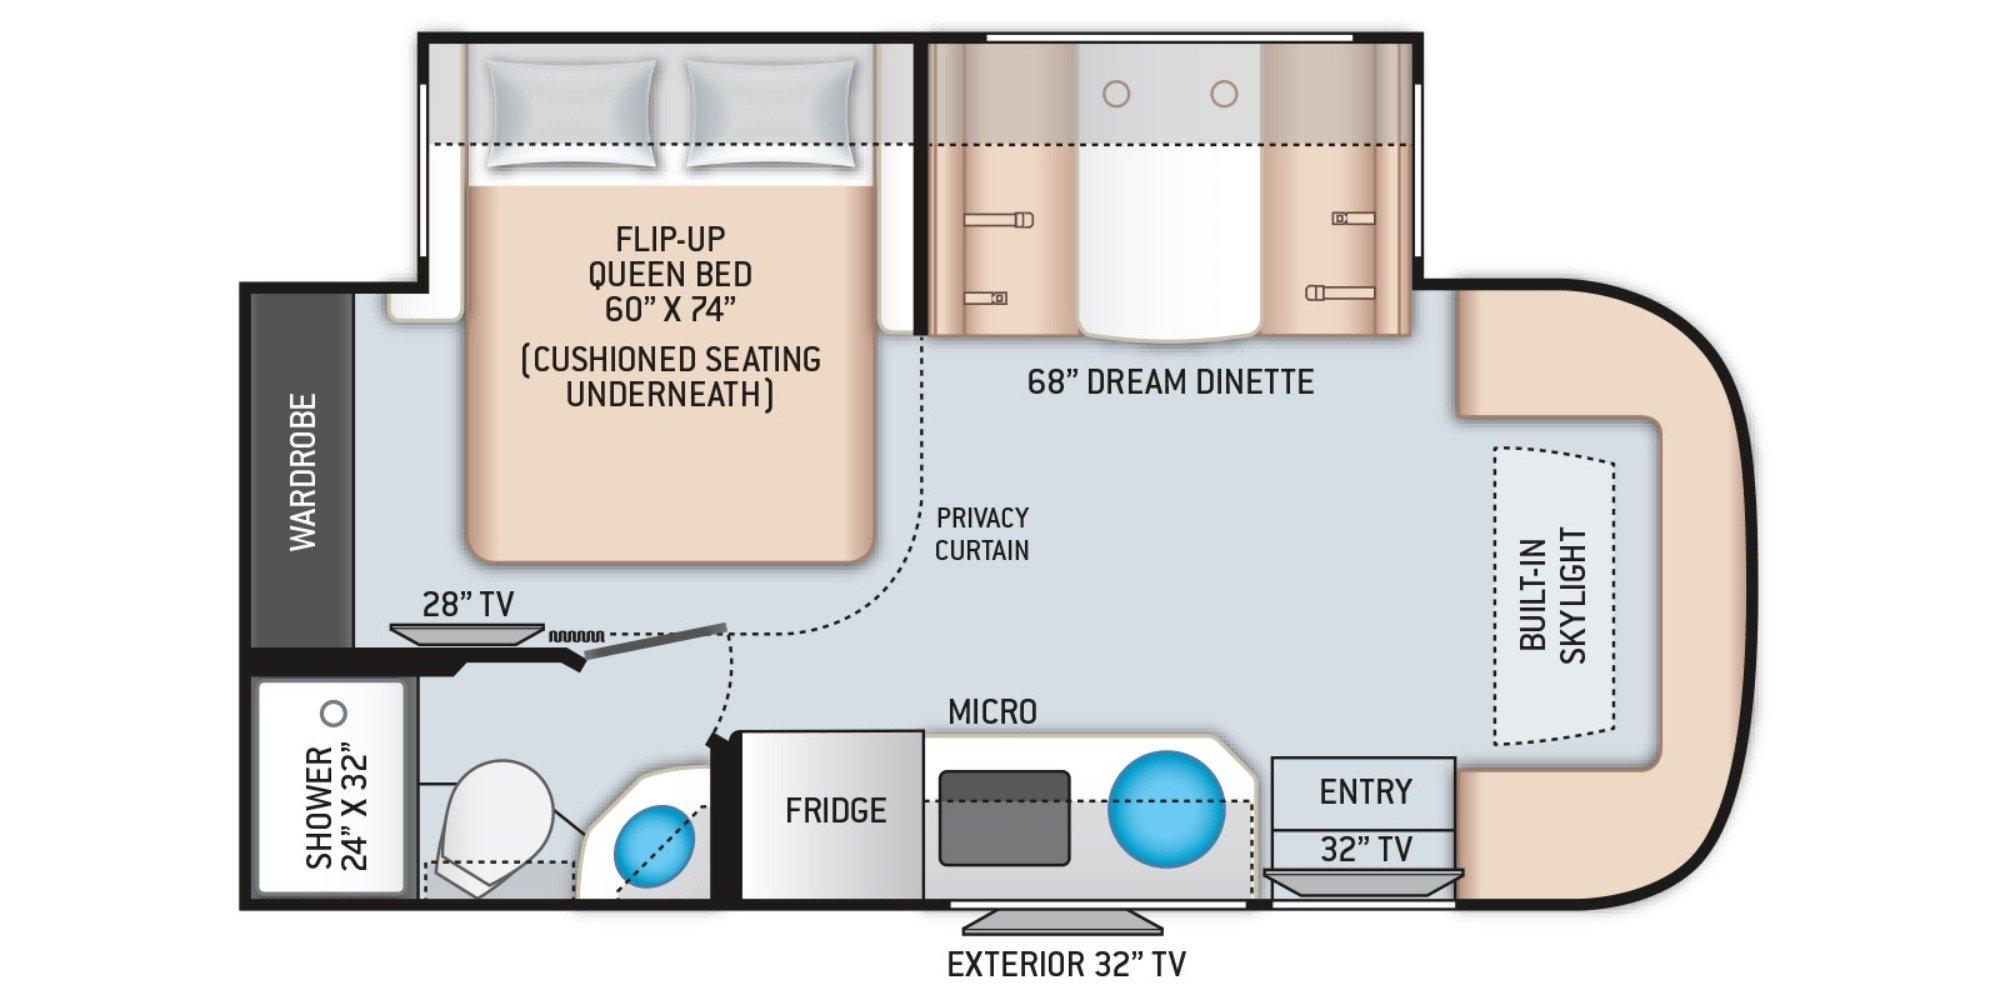 View Floor Plan for 2021 THOR GEMINI 23TW